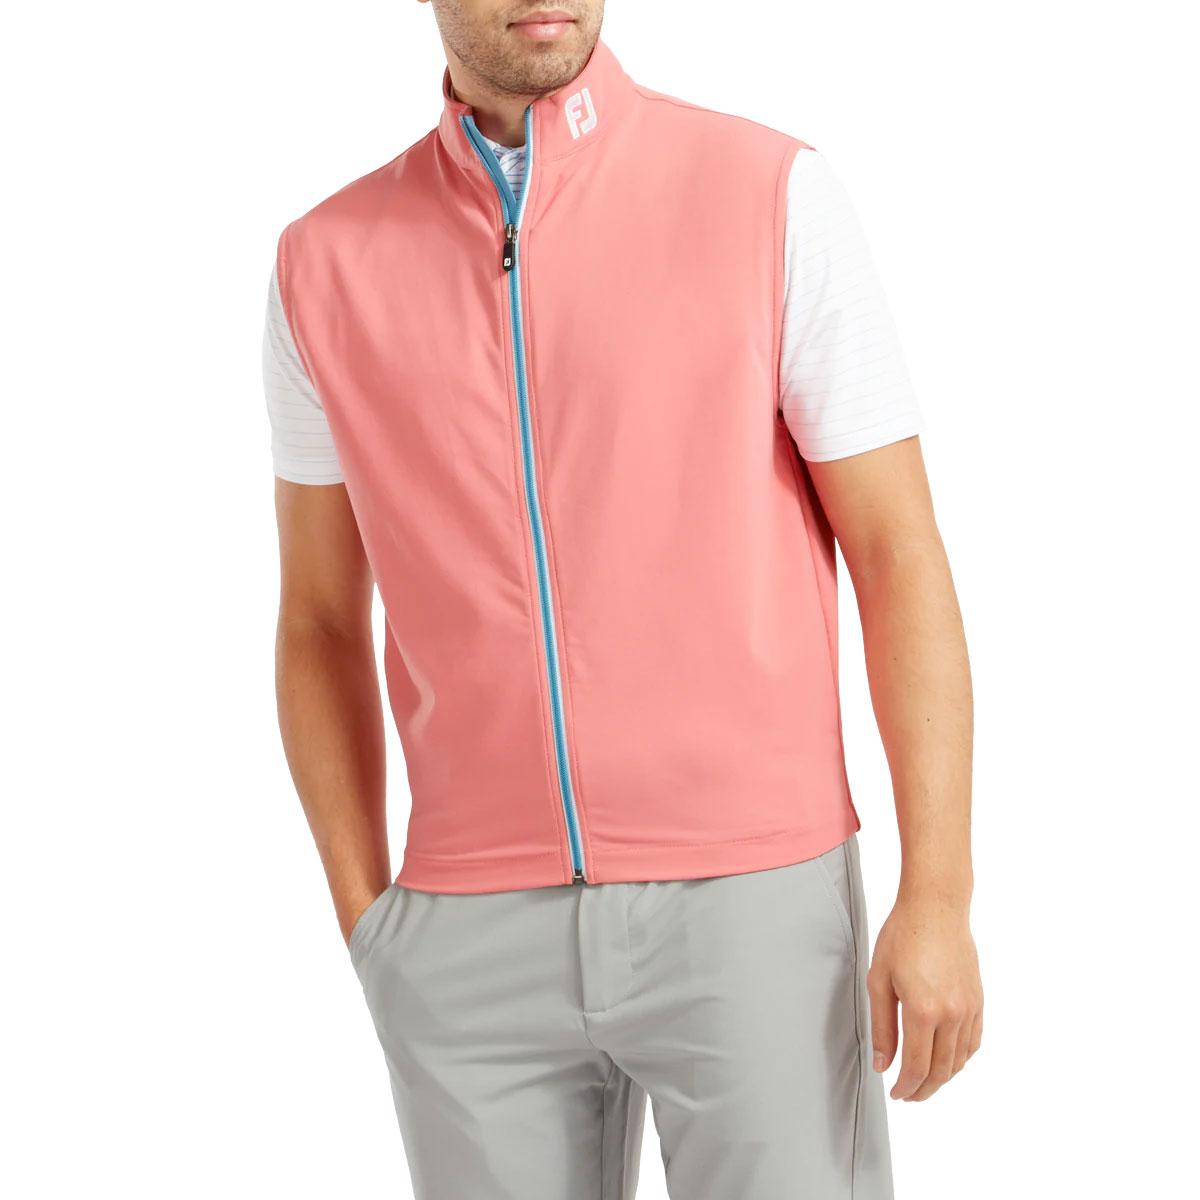 FootJoy Full Zip Knit Vest Mens Golf Gilet